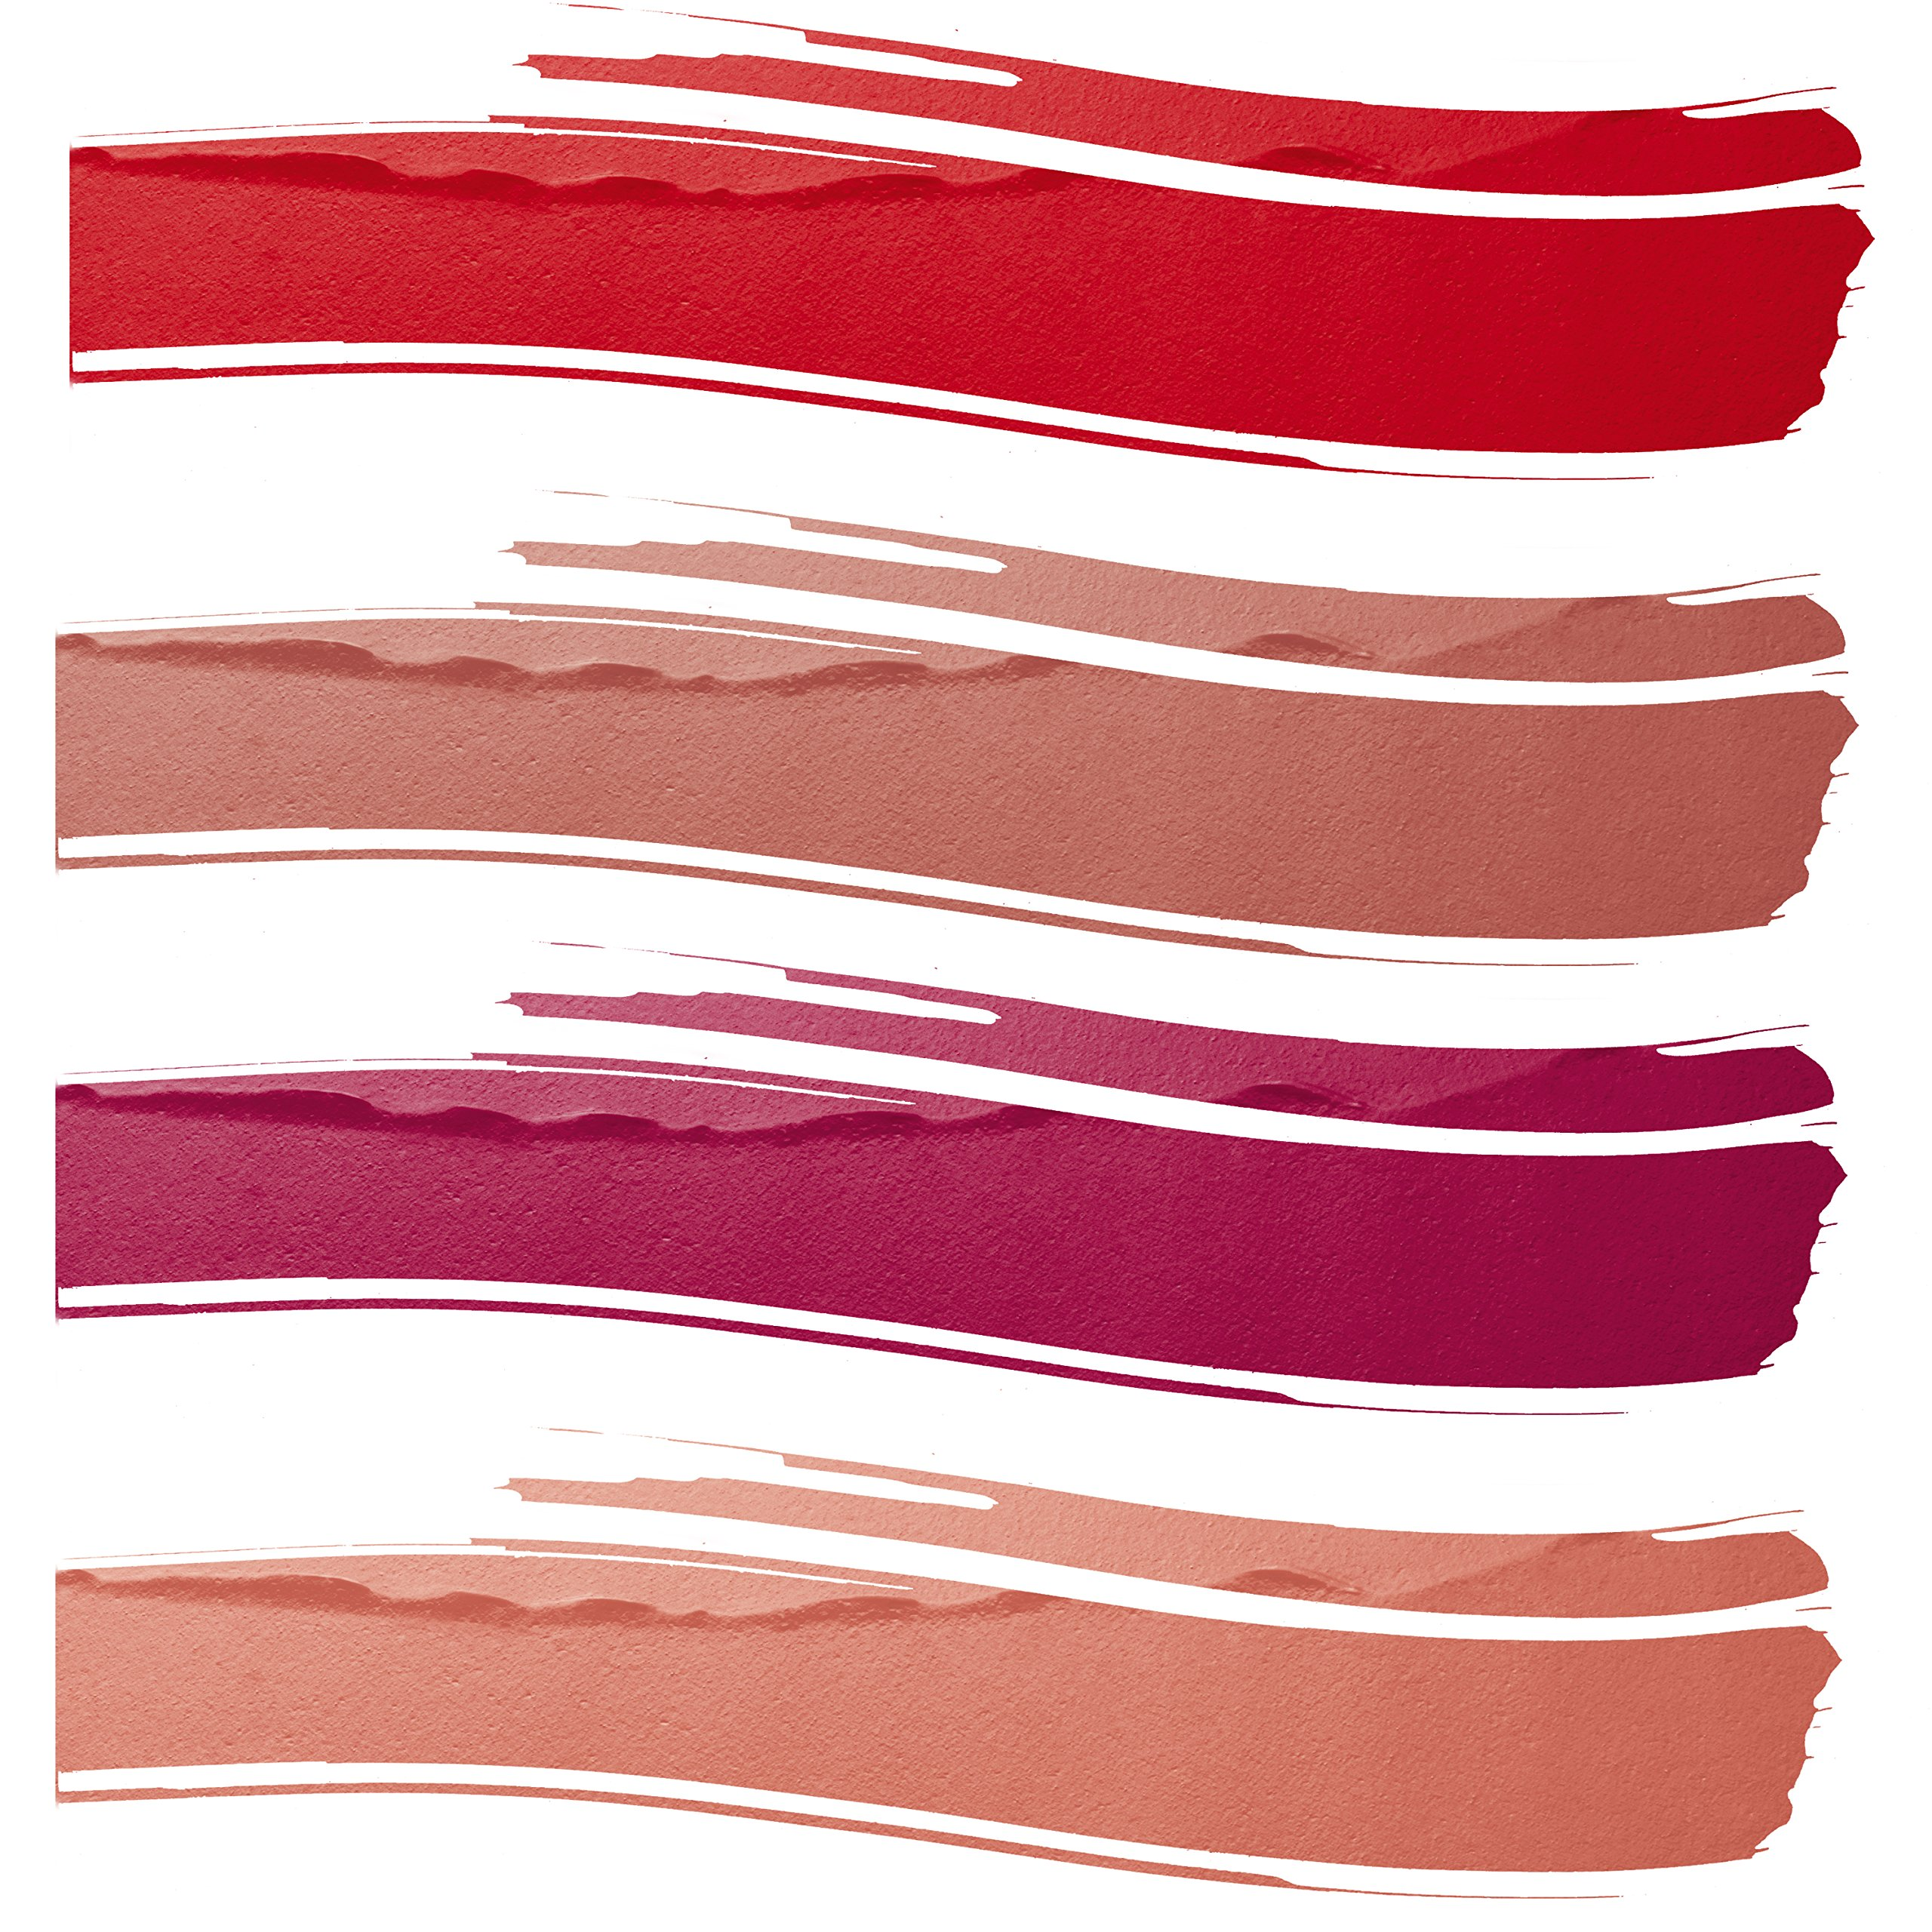 L'Oreal Paris Cosmetics Infallible Pro-Matte Lip Gloss Set by L'Oreal Paris (Image #3)